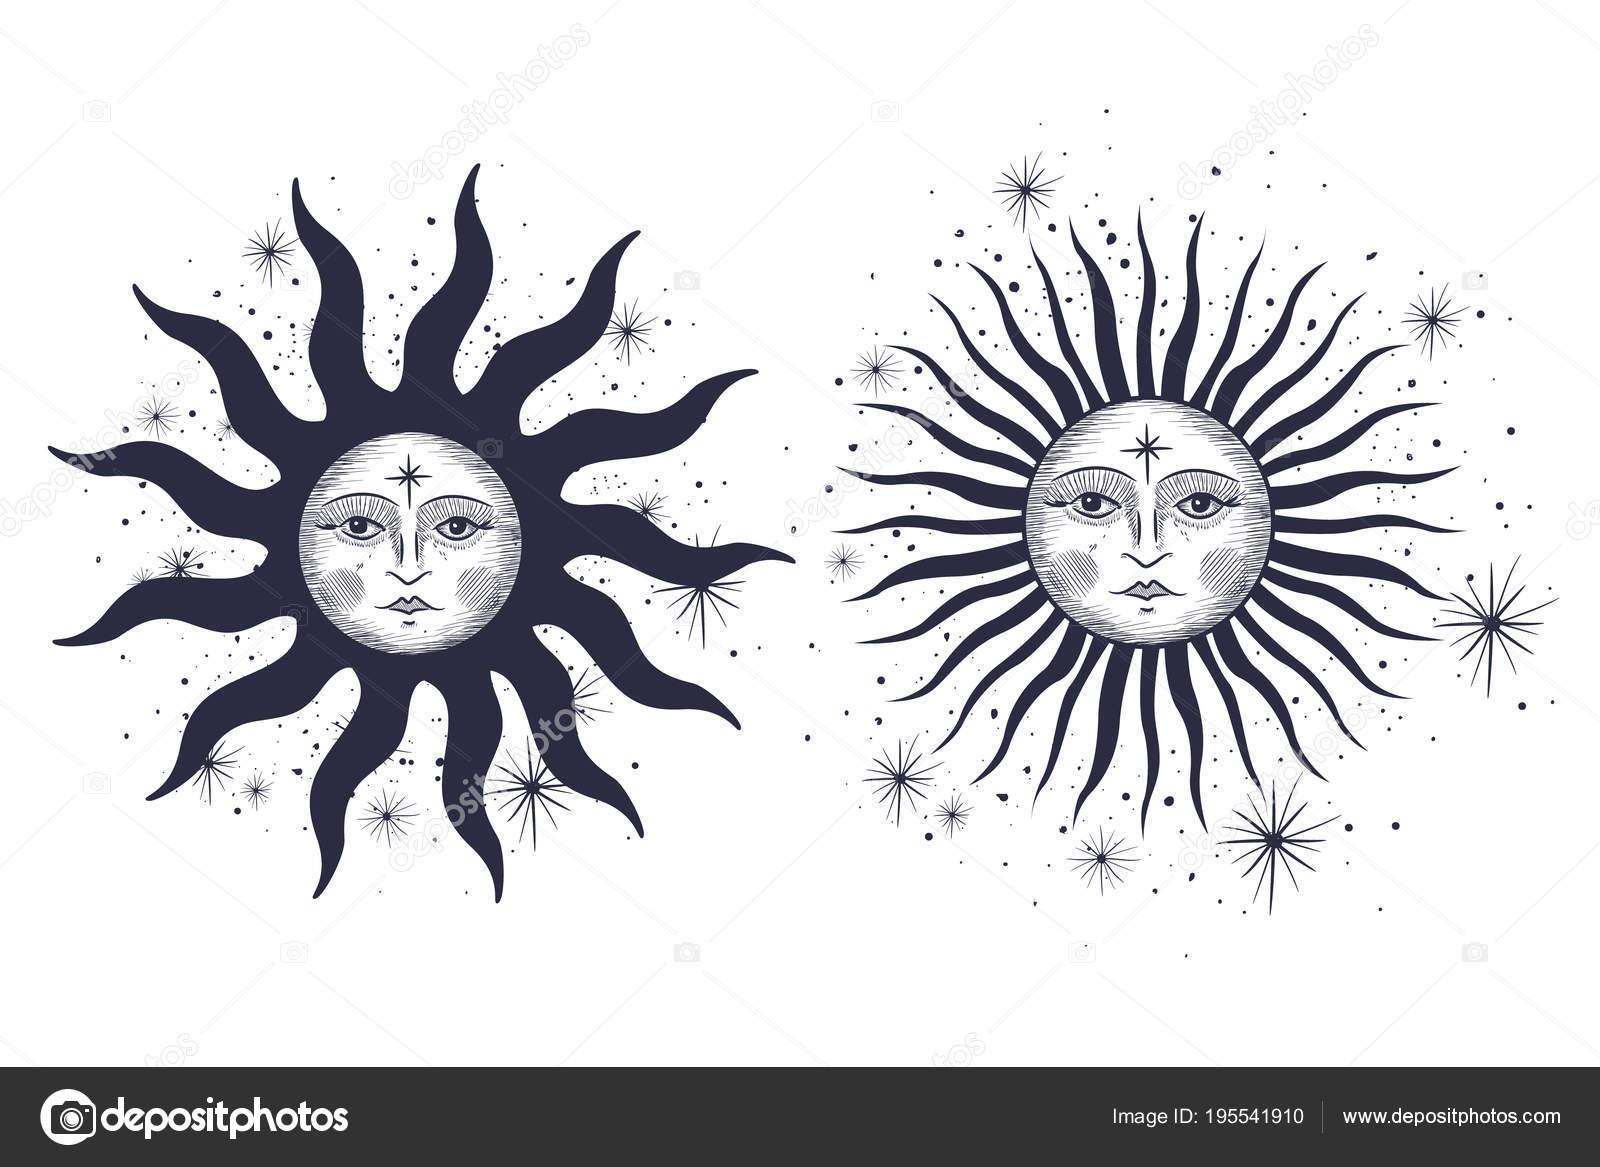 Sun and moon designs tattoos | Face Sun Moon Stars Masonic Tattoo ...